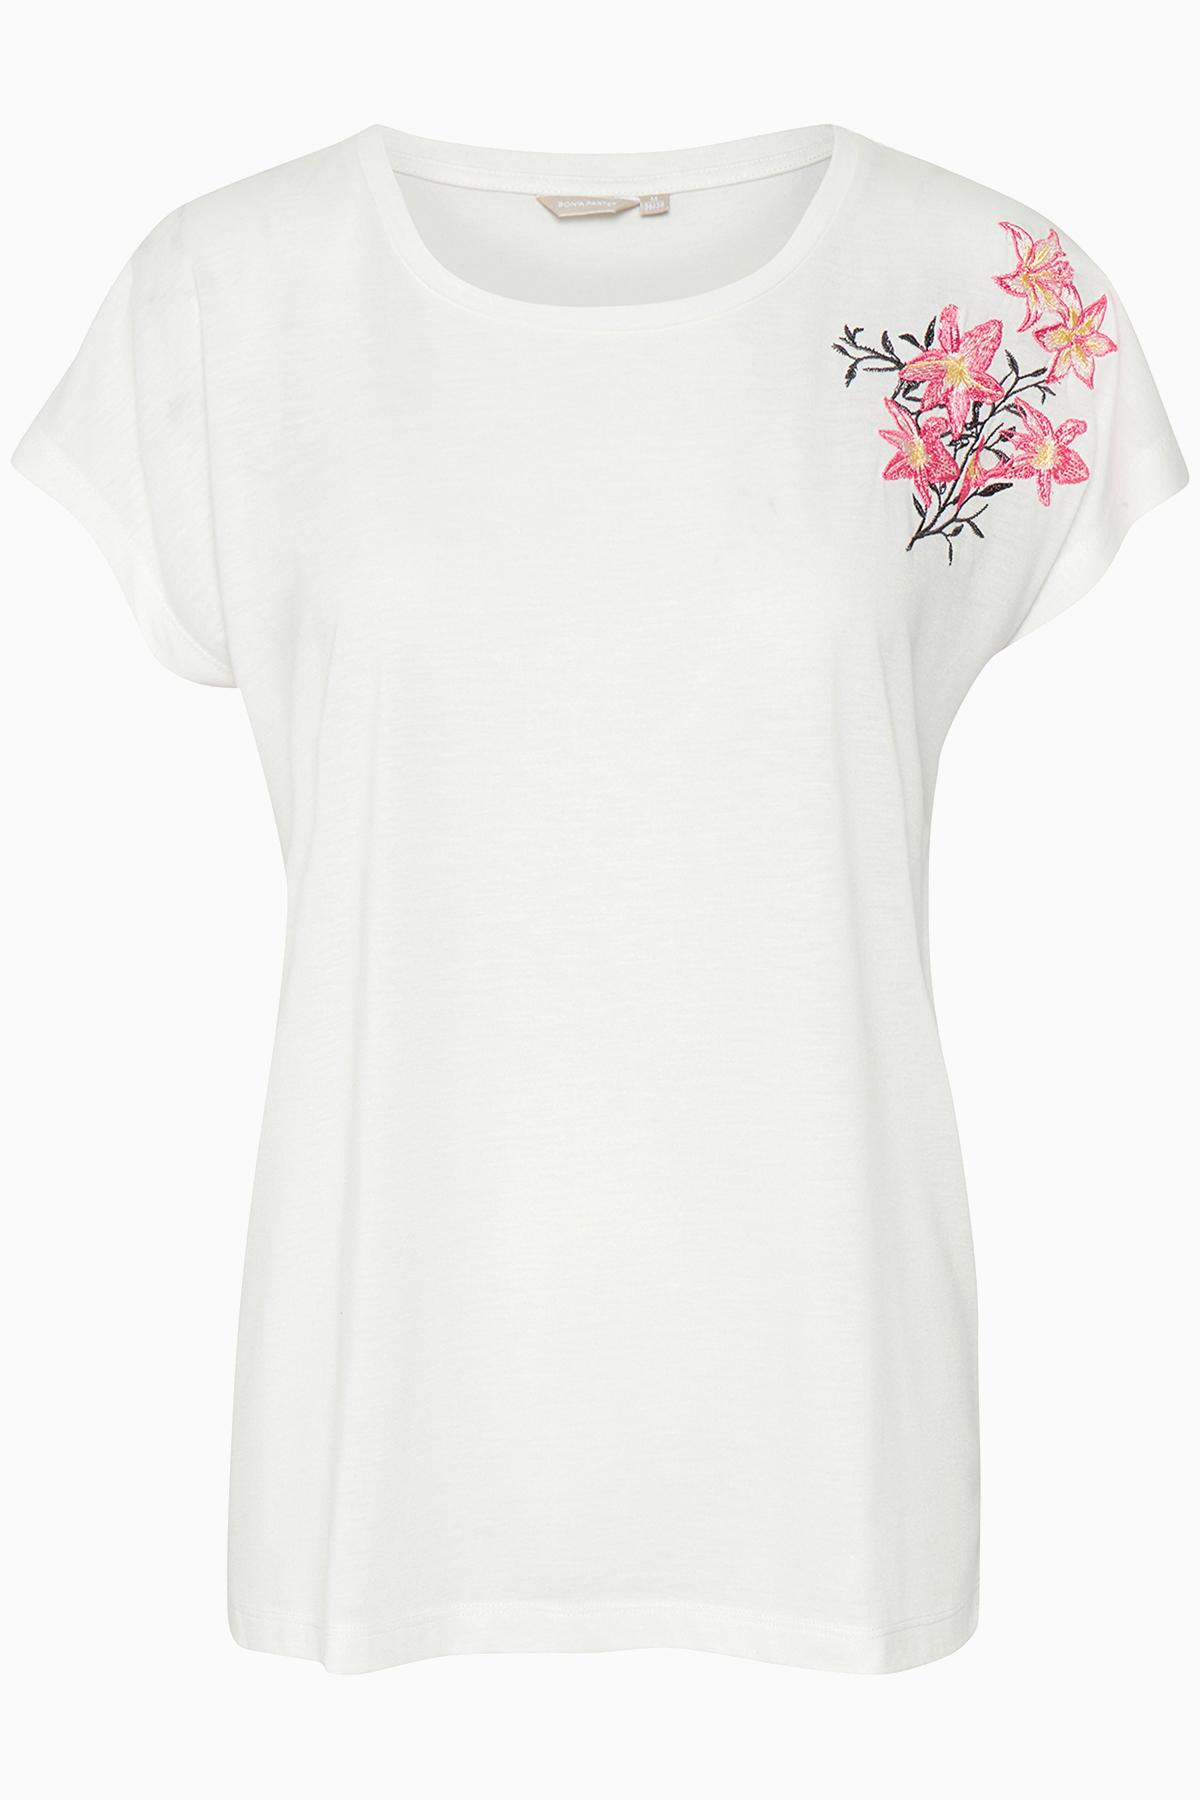 Image of BonA Parte Dame Virkelig sød Idalia T-shirt - Off-white